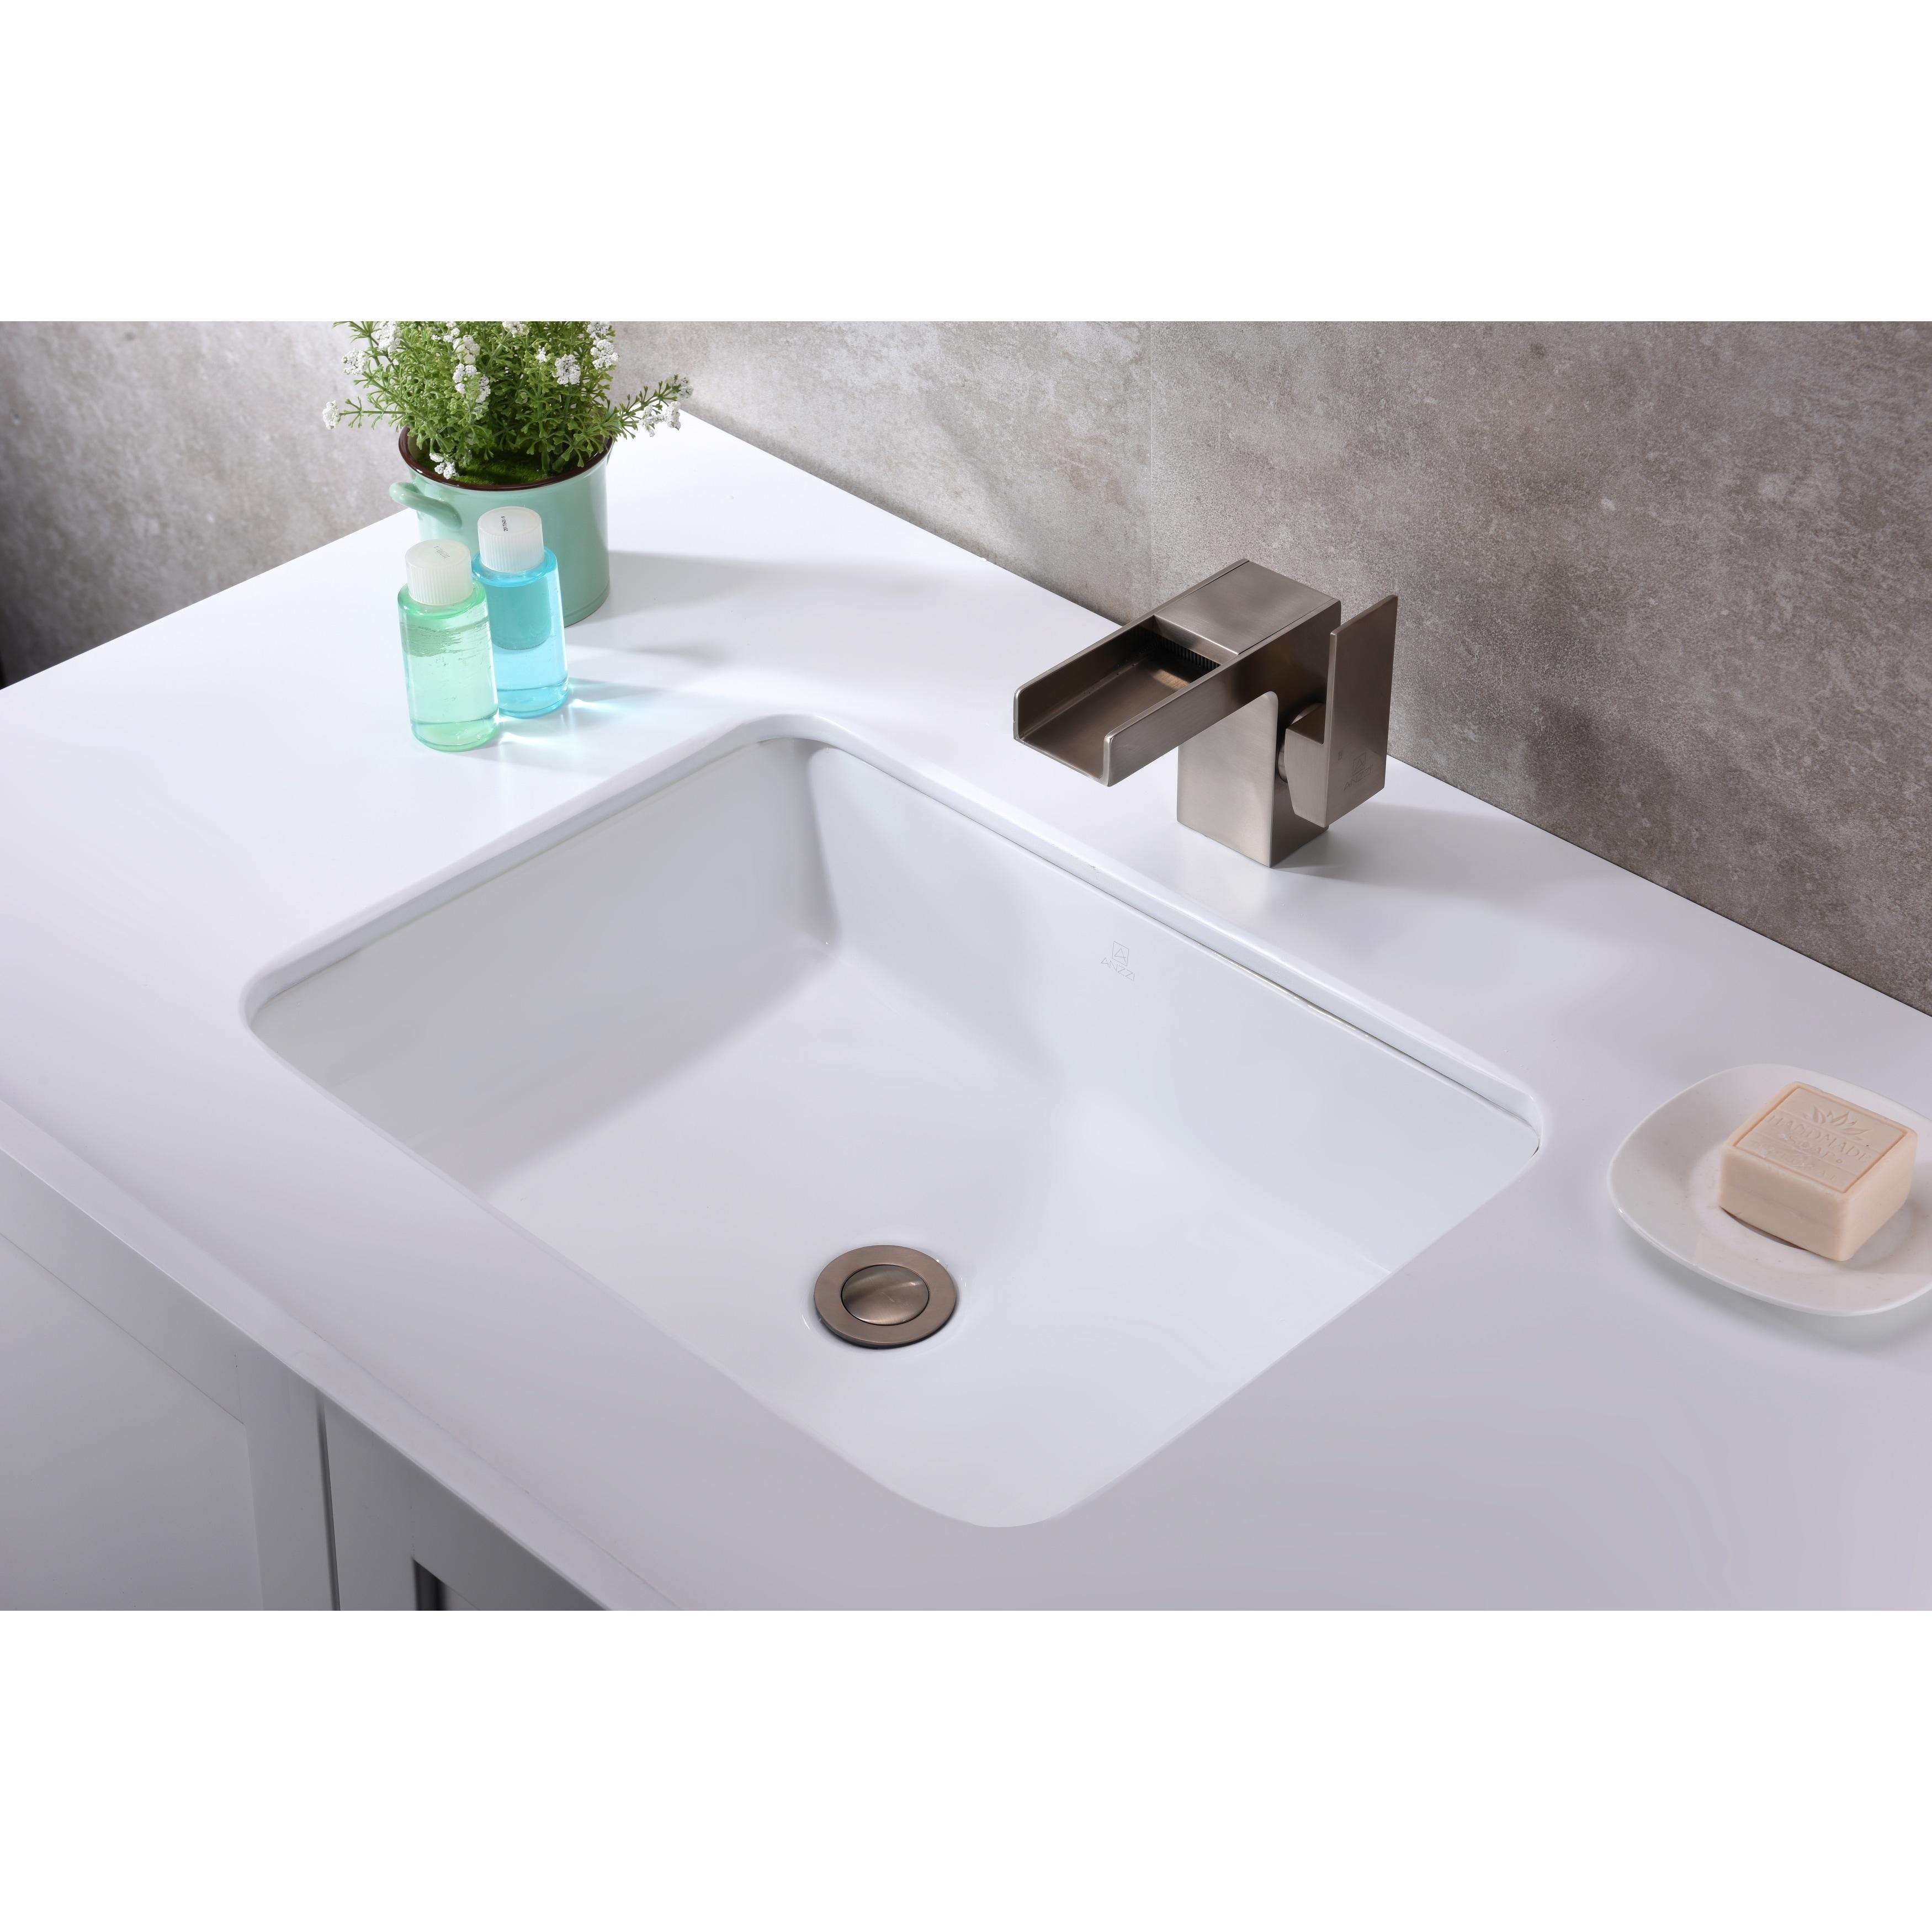 Ceramic Undermount Sink Basin